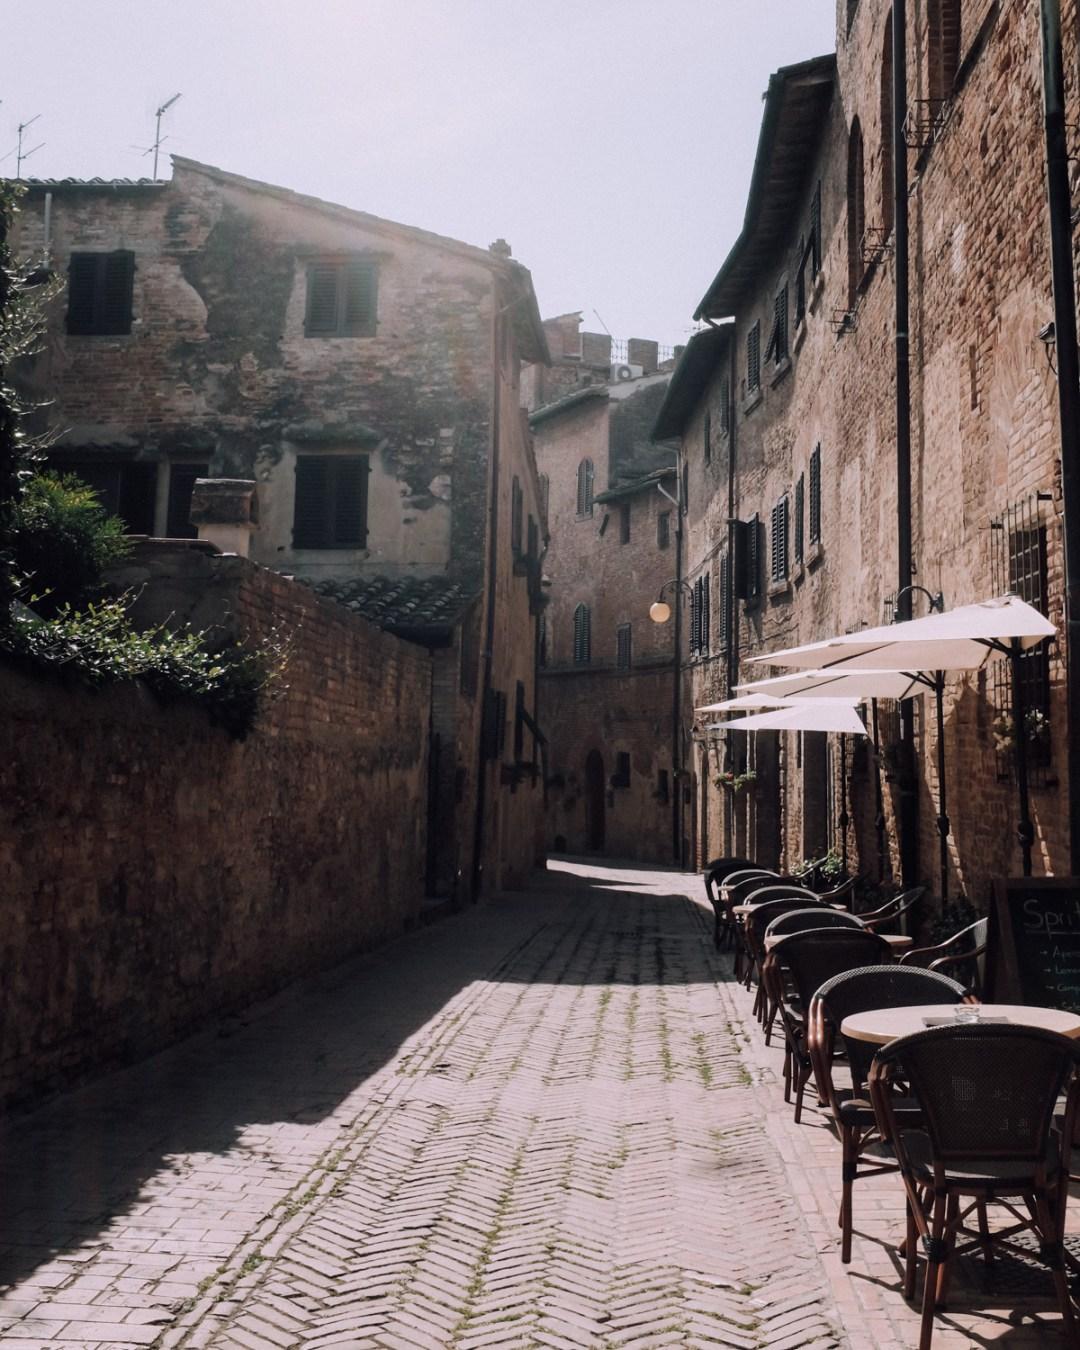 inastil, Ü50Blogger, Reiseblogger, Toskana, Villa, Florenz, Siena, Certaldo, Lifestyle, Italienreise, Italienliebe, Cabriotour-18